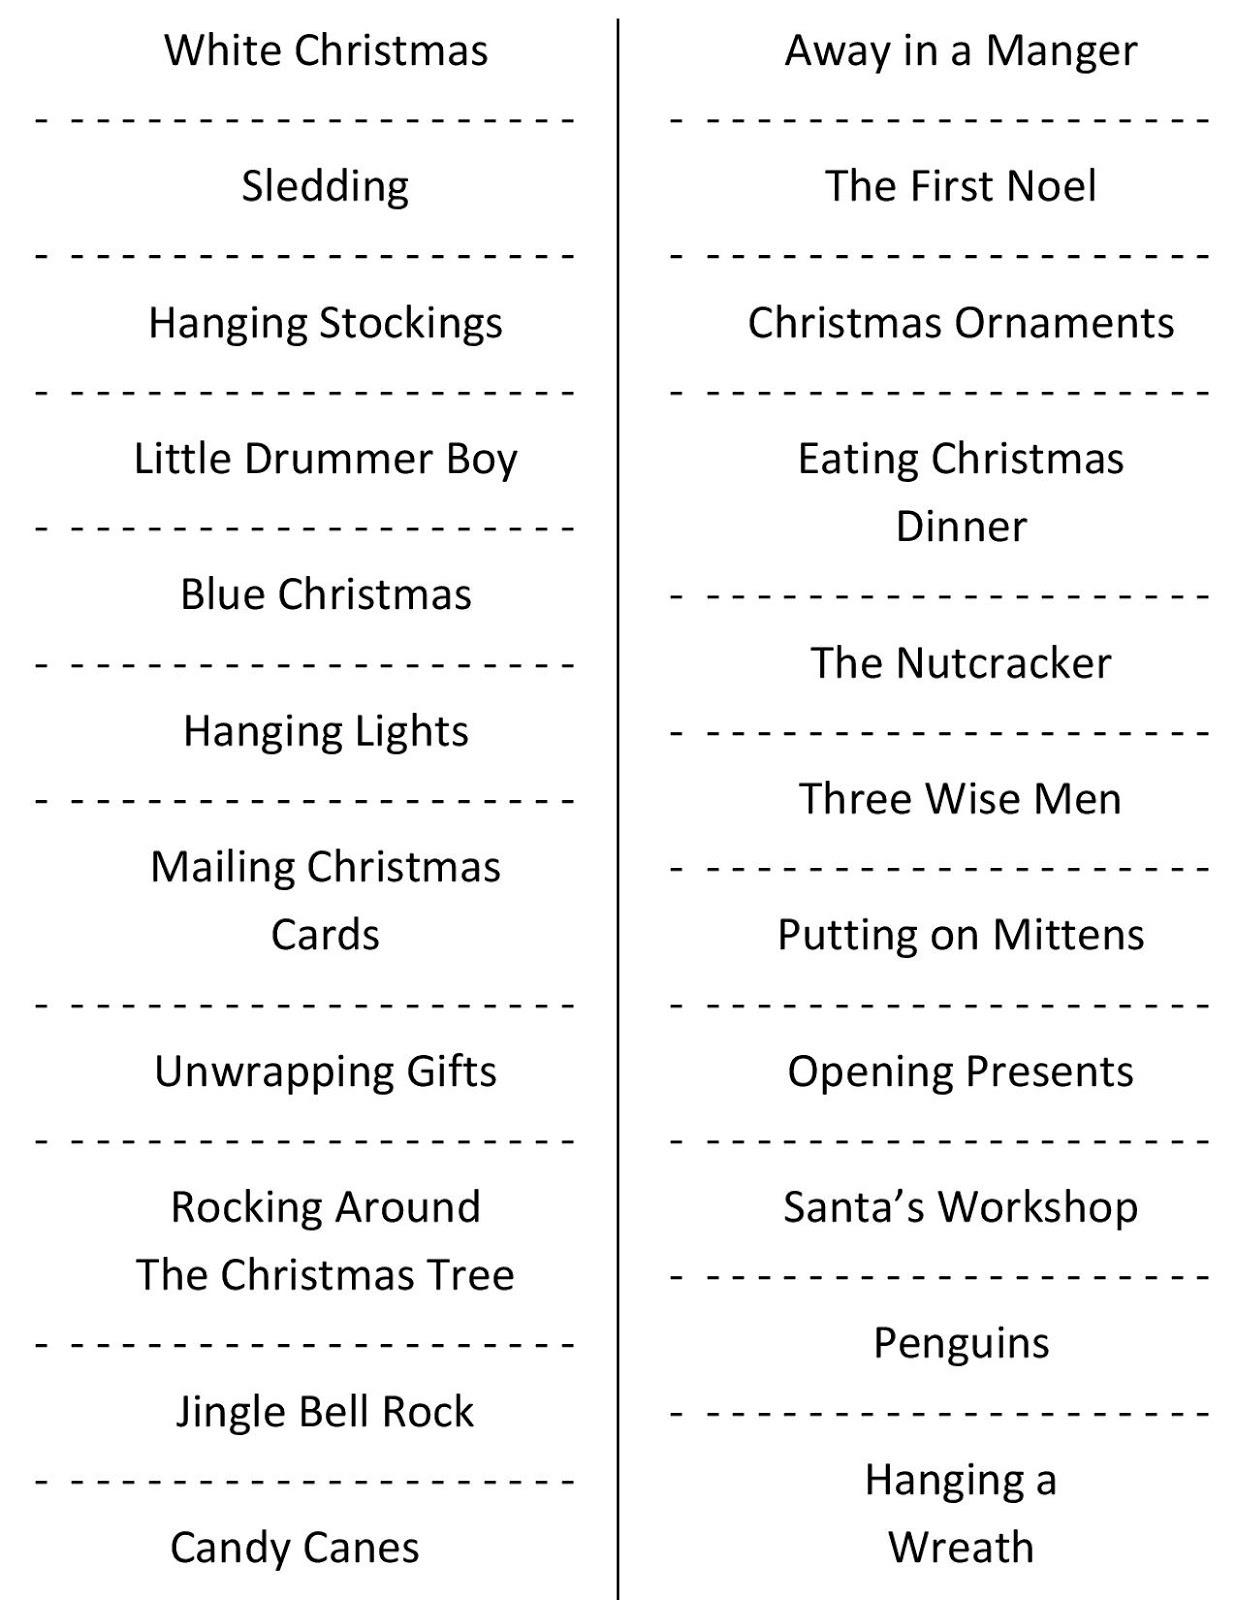 Christmas Charades (Free Printable Party Game) - Free Printable Charades Cards